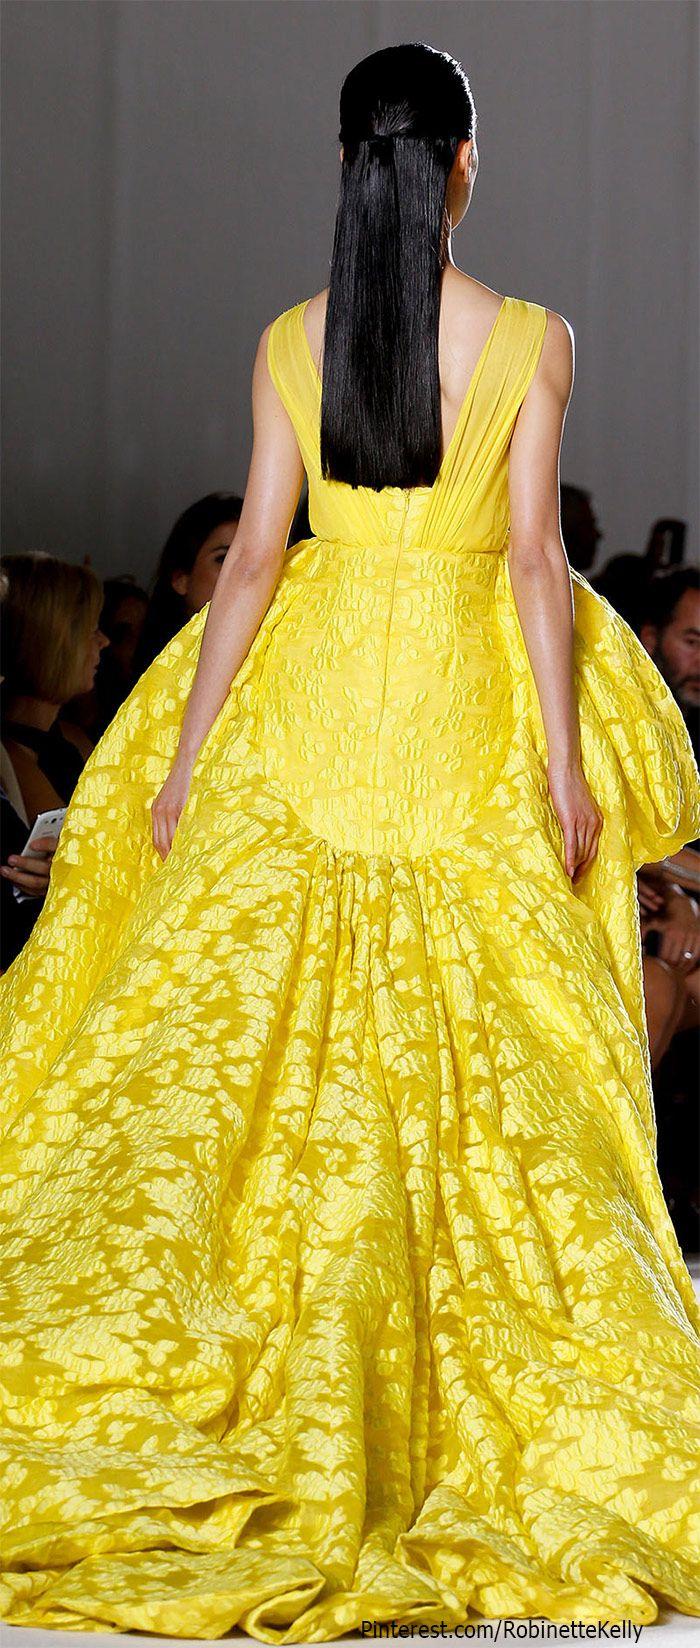 best lemon and lime images on pinterest